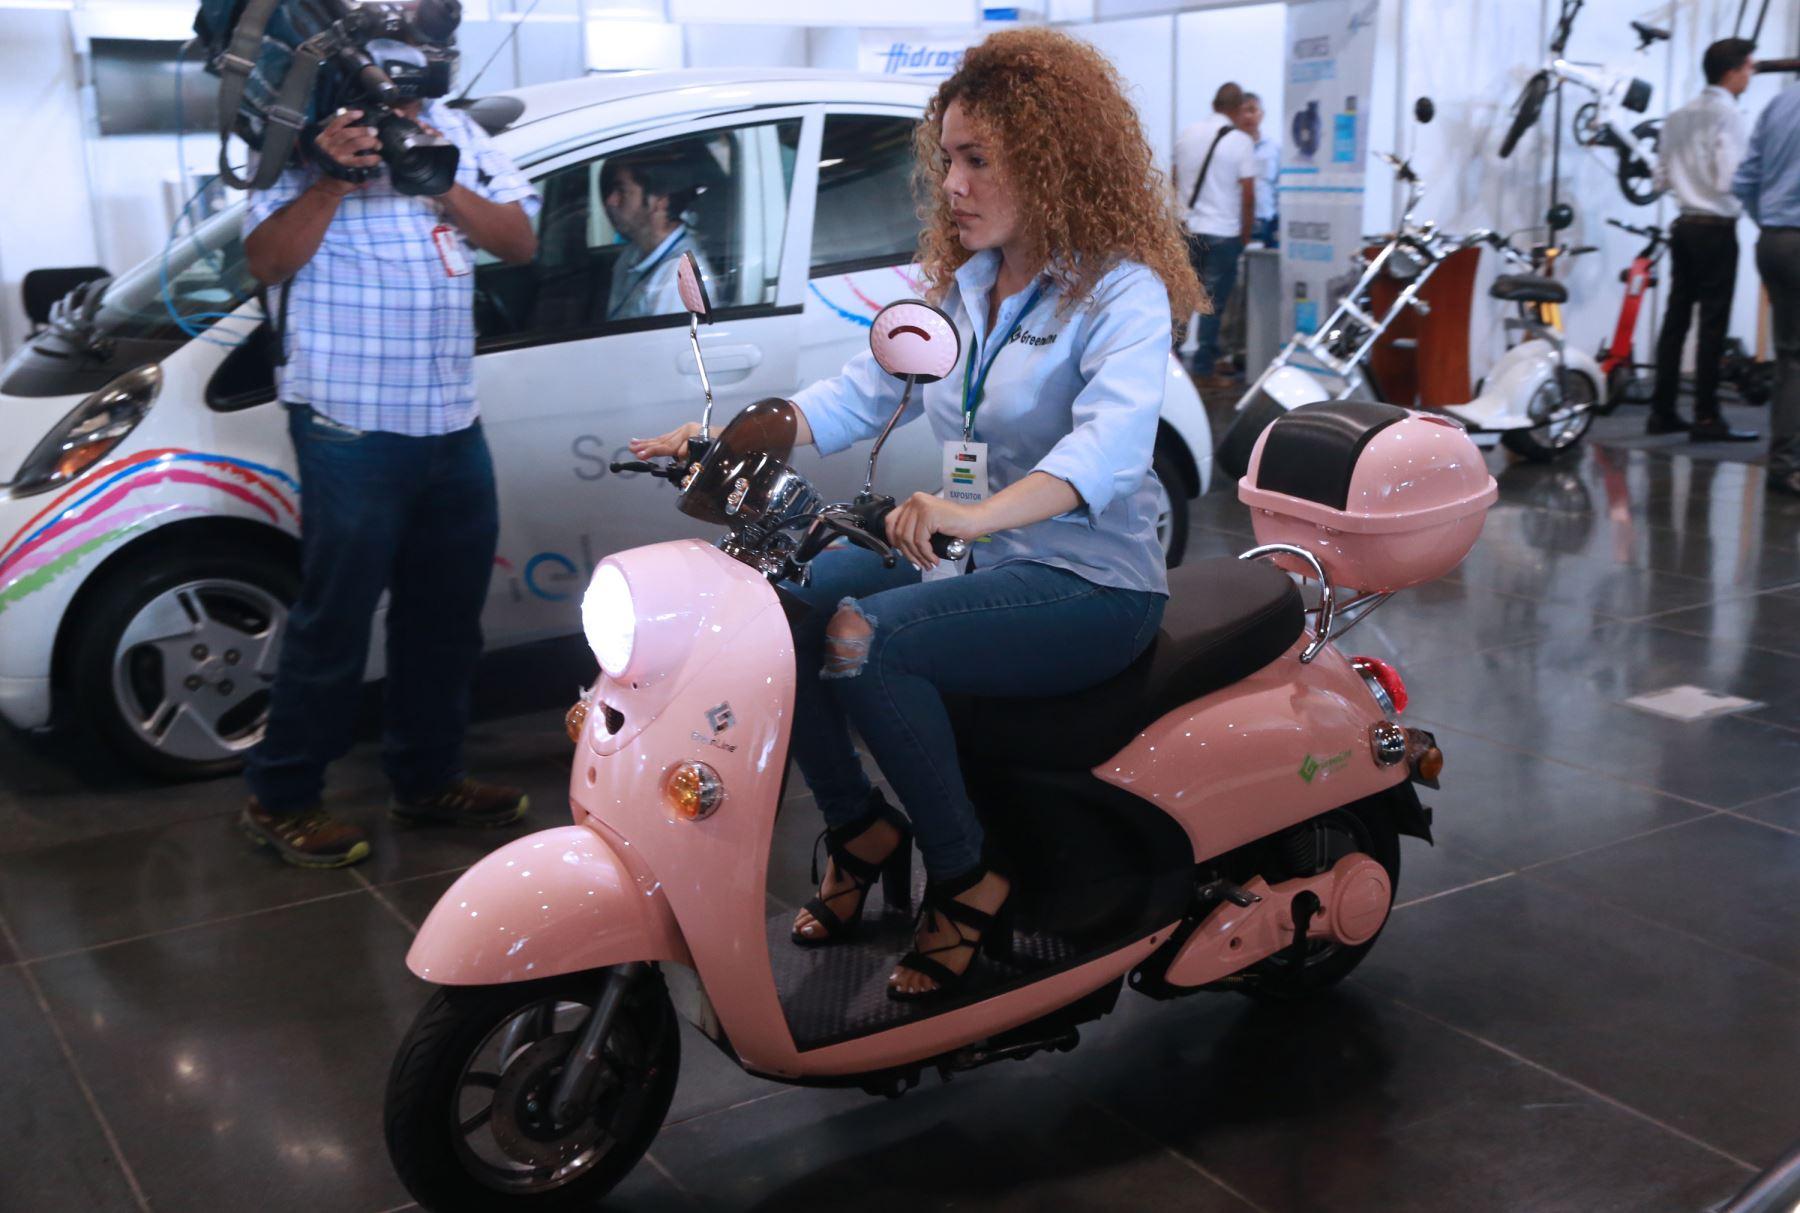 Moto 100% eléctrica. ANDINA/Norman Córdova